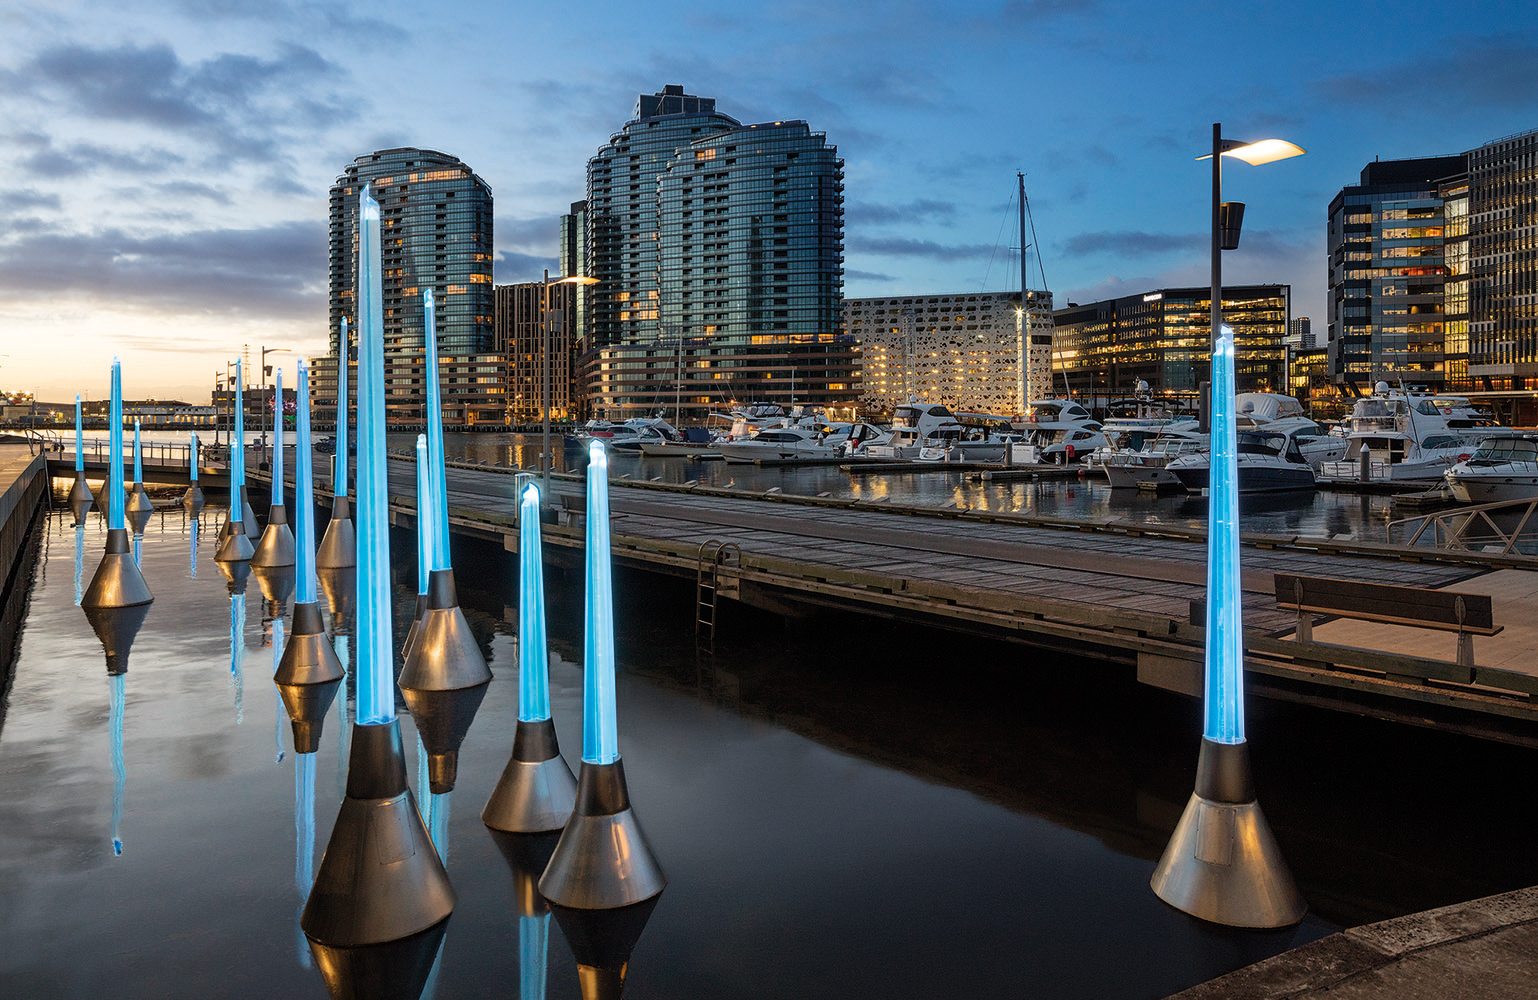 Tracy Sarroff, 'Light Buoys', 2017, Docklands, Melbourne. Photograph: John Gollings